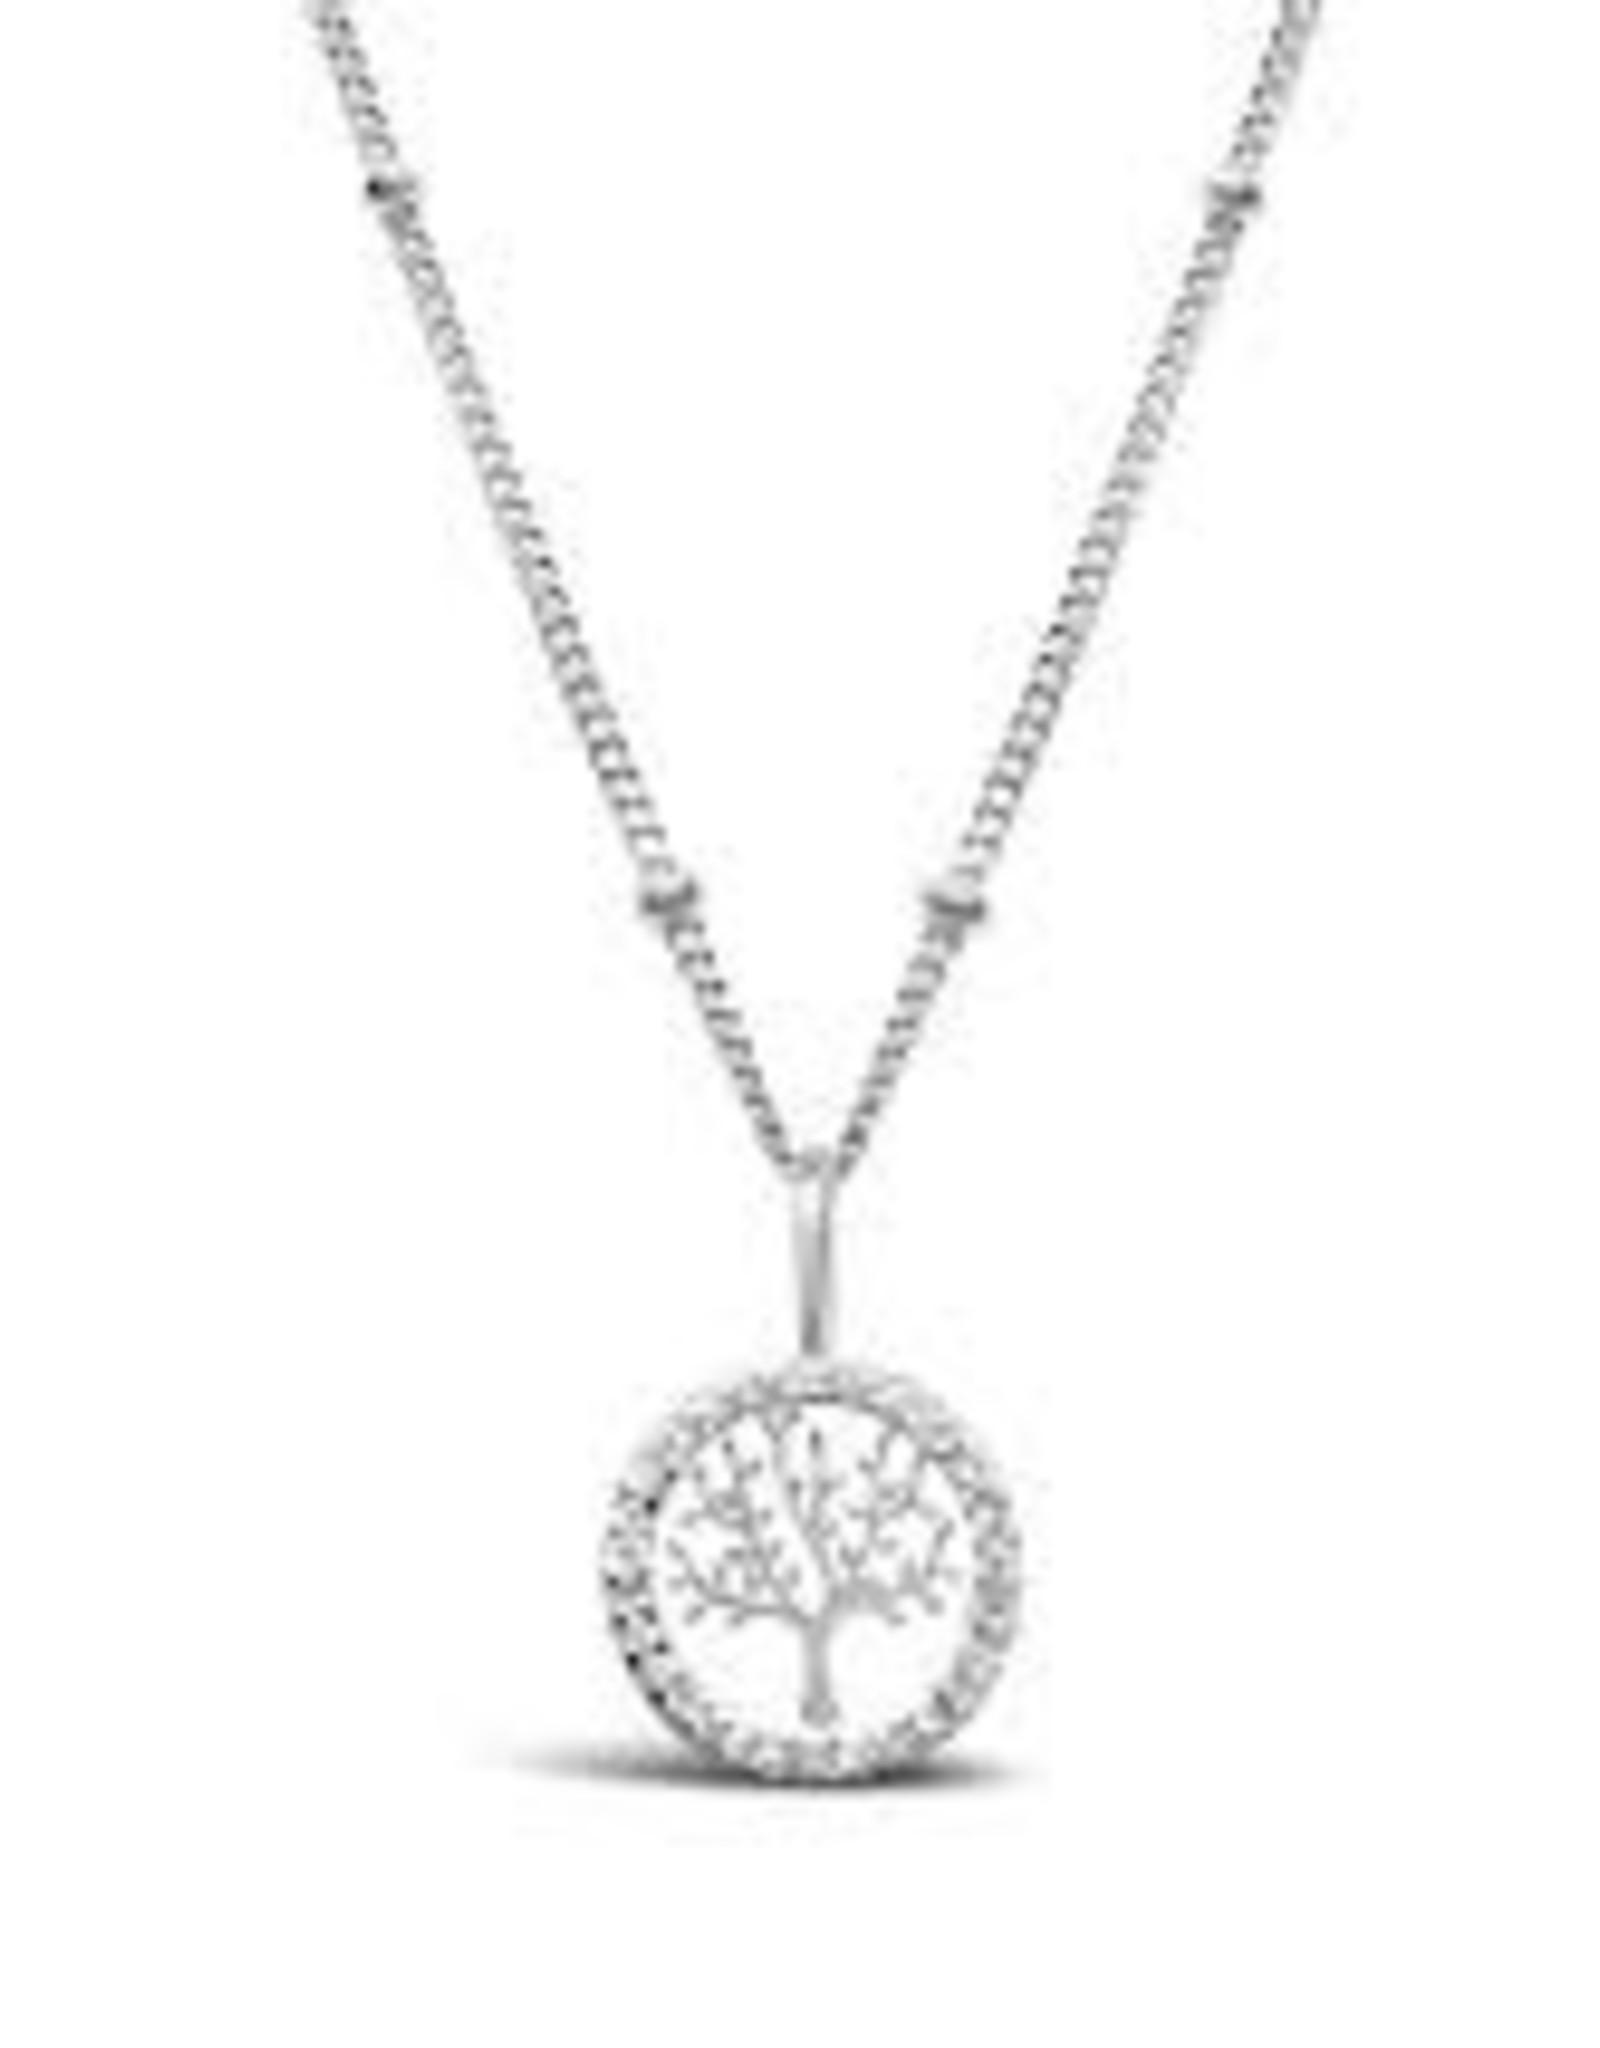 Stia Jewelry Necklace - Tree of Life